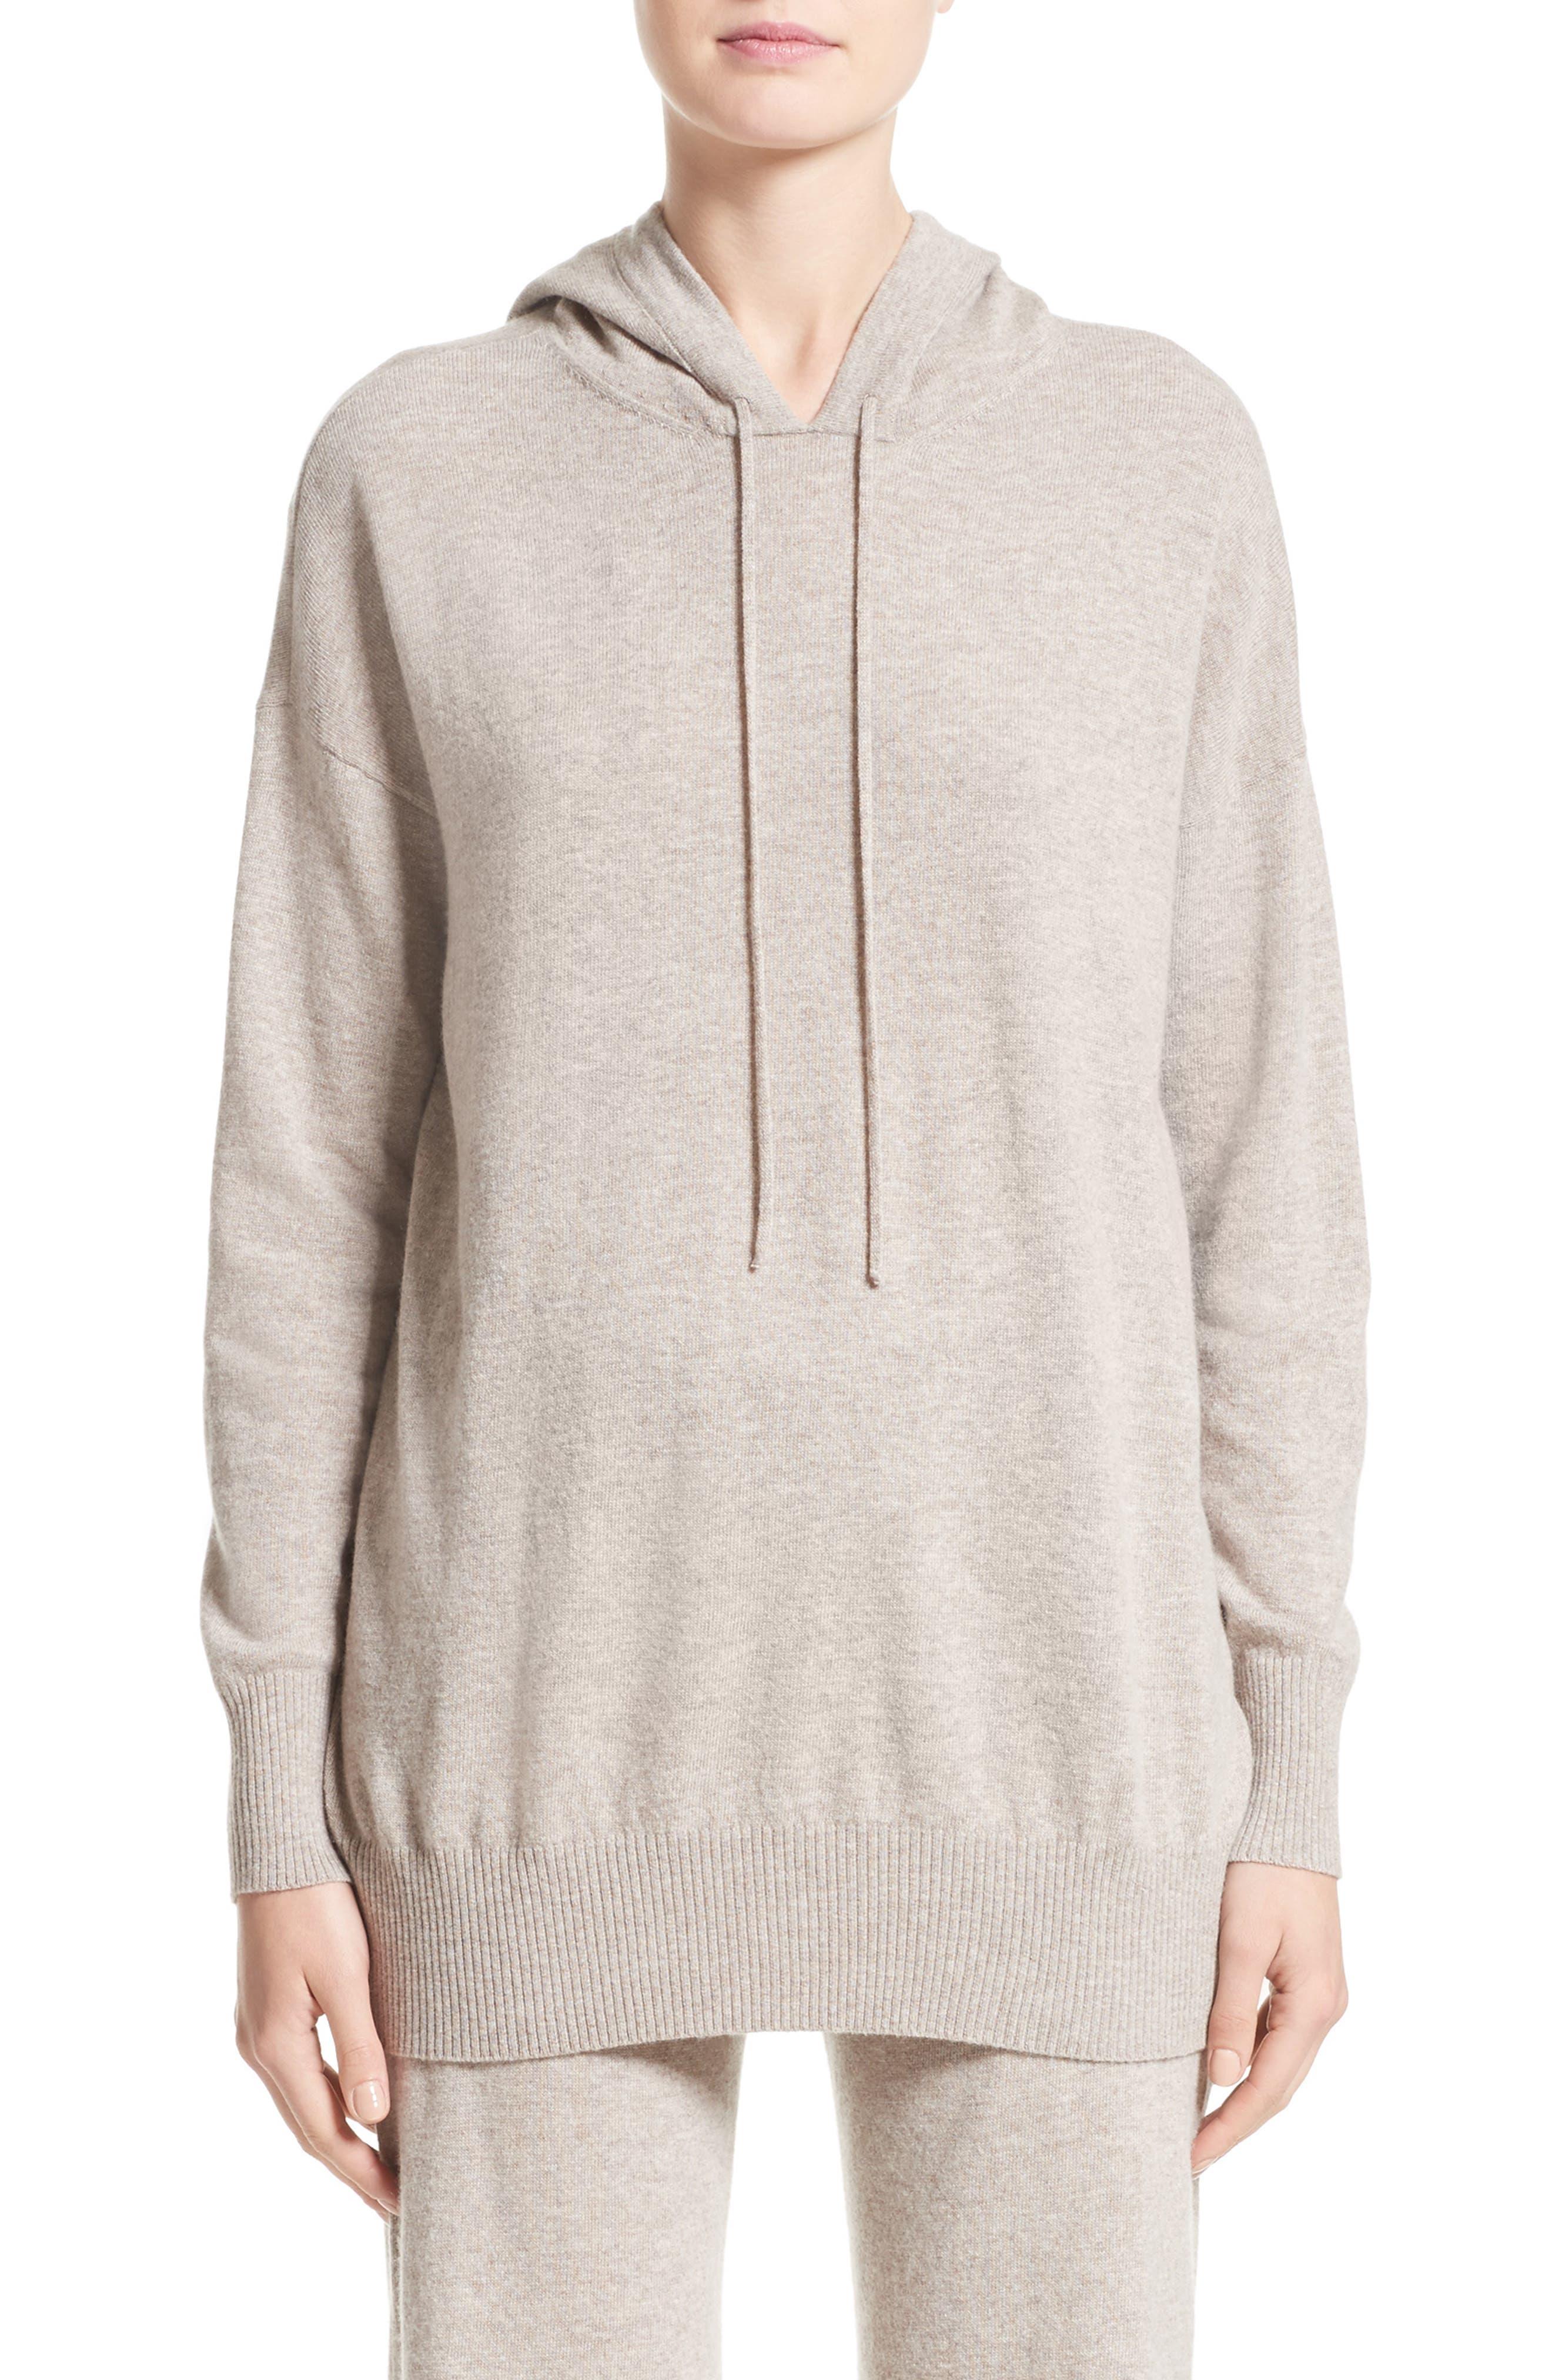 Main Image - Max Mara Nitra Wool & Cashmere Hooded Sweater